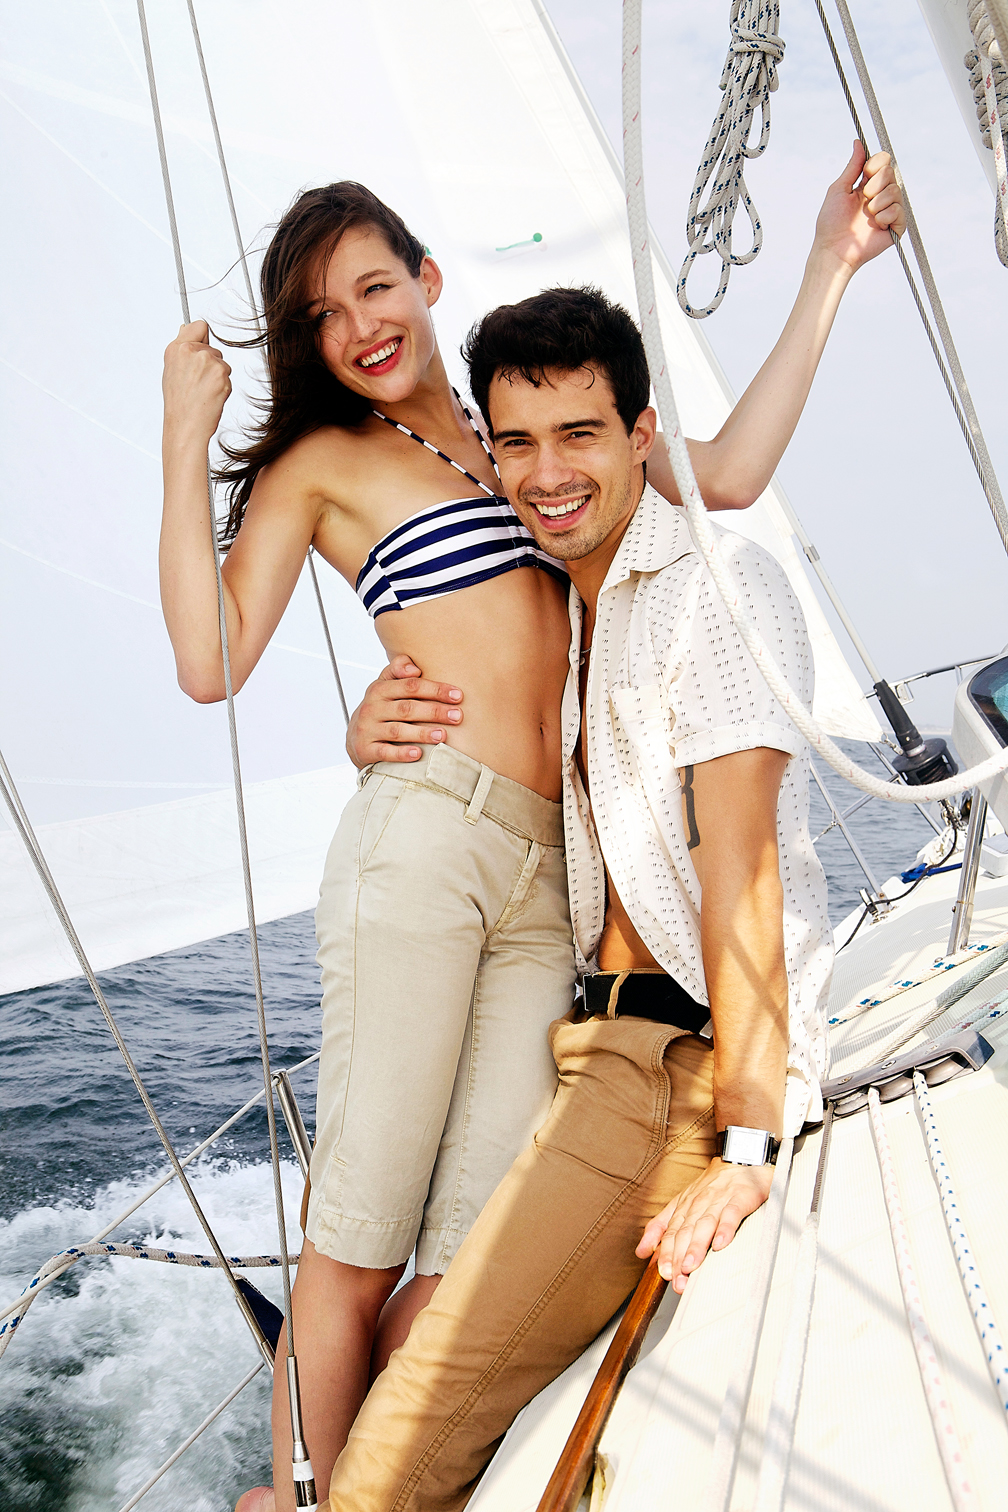 Romantic Get-a-Way Sail